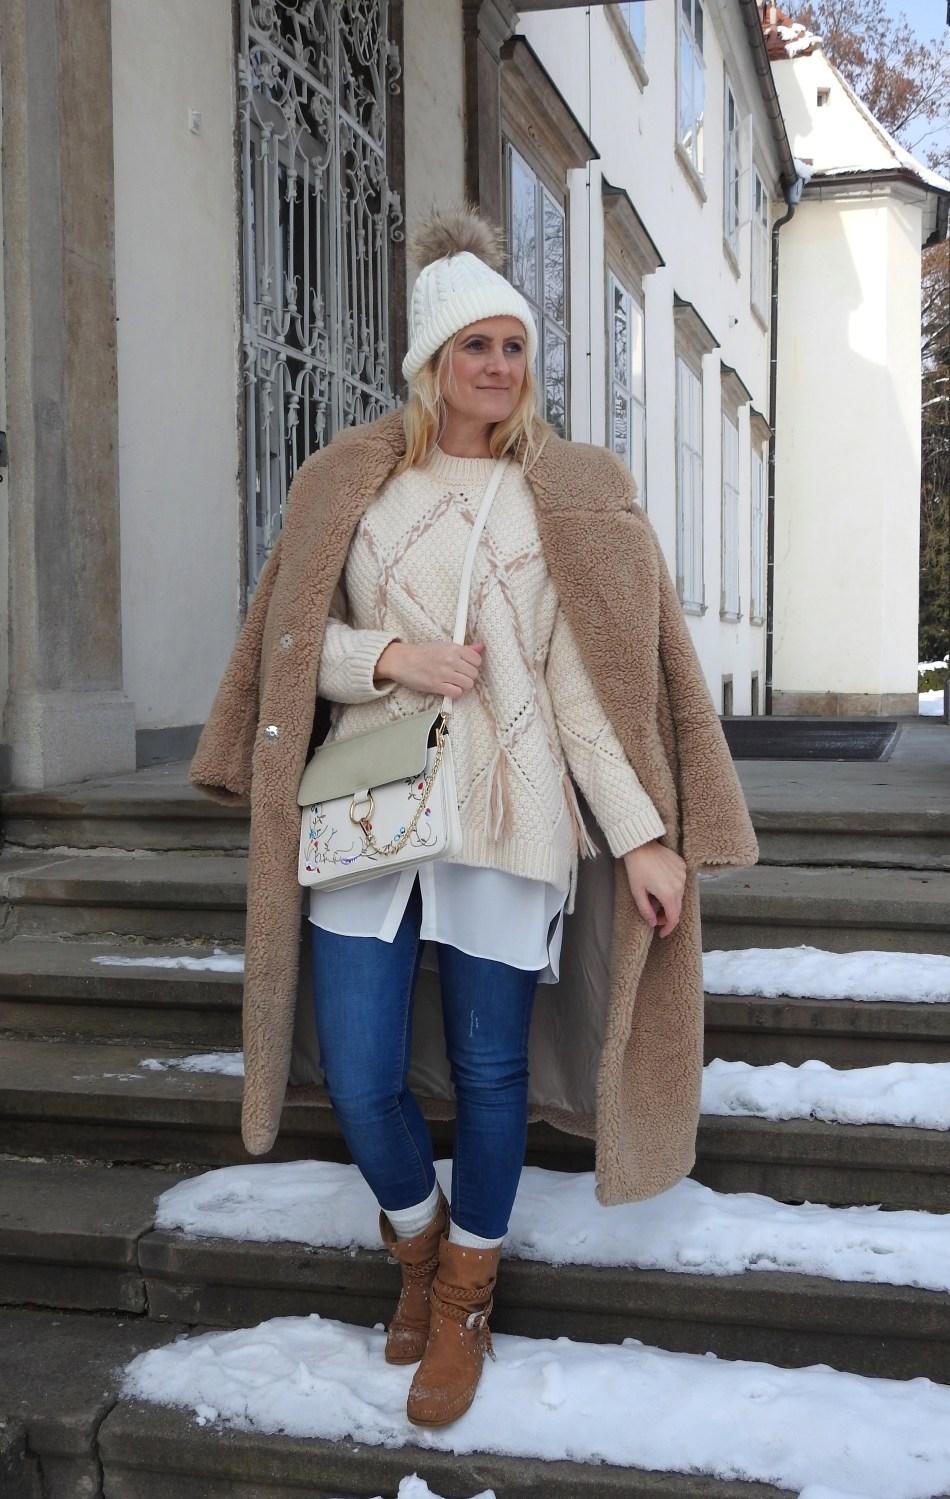 Tipps-gegen-Kälte-Frieren-Teddycoat-Teddy-Coat-Chloe-Bag-Winterlook-Blouse-White-Strickpullover-Sweater-carrieslifestyle-Tamara-Prutsch